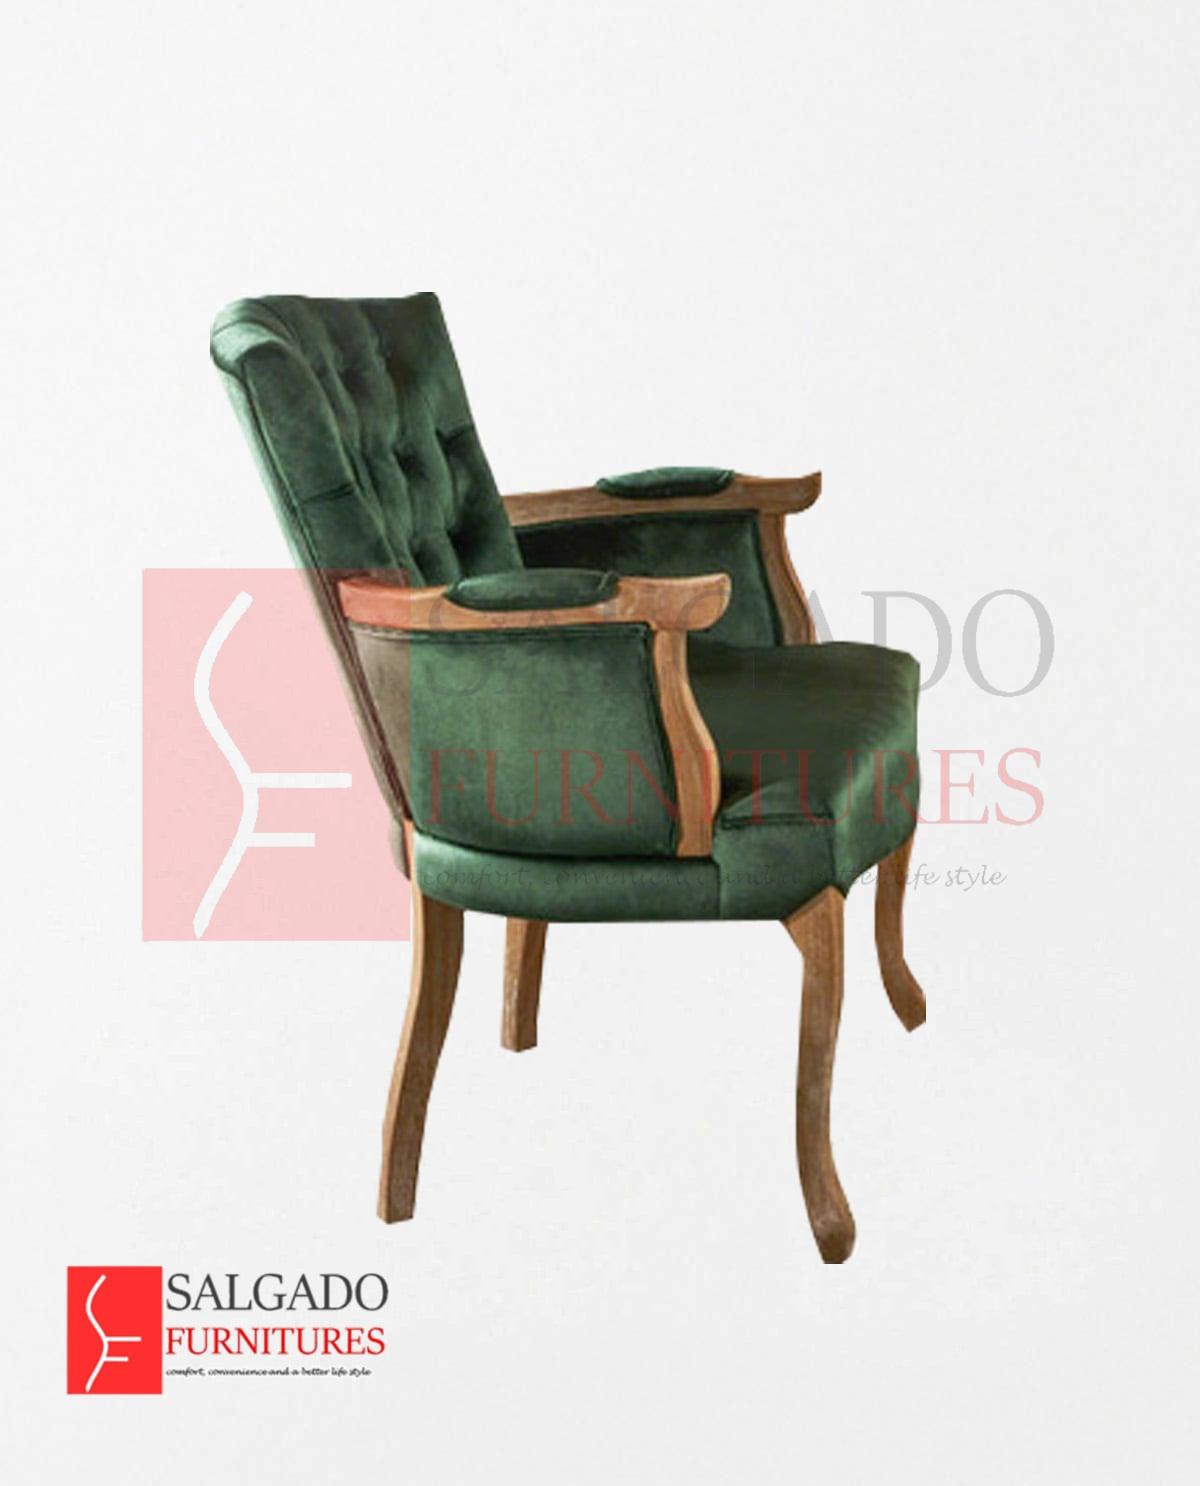 chairs-sri lanka